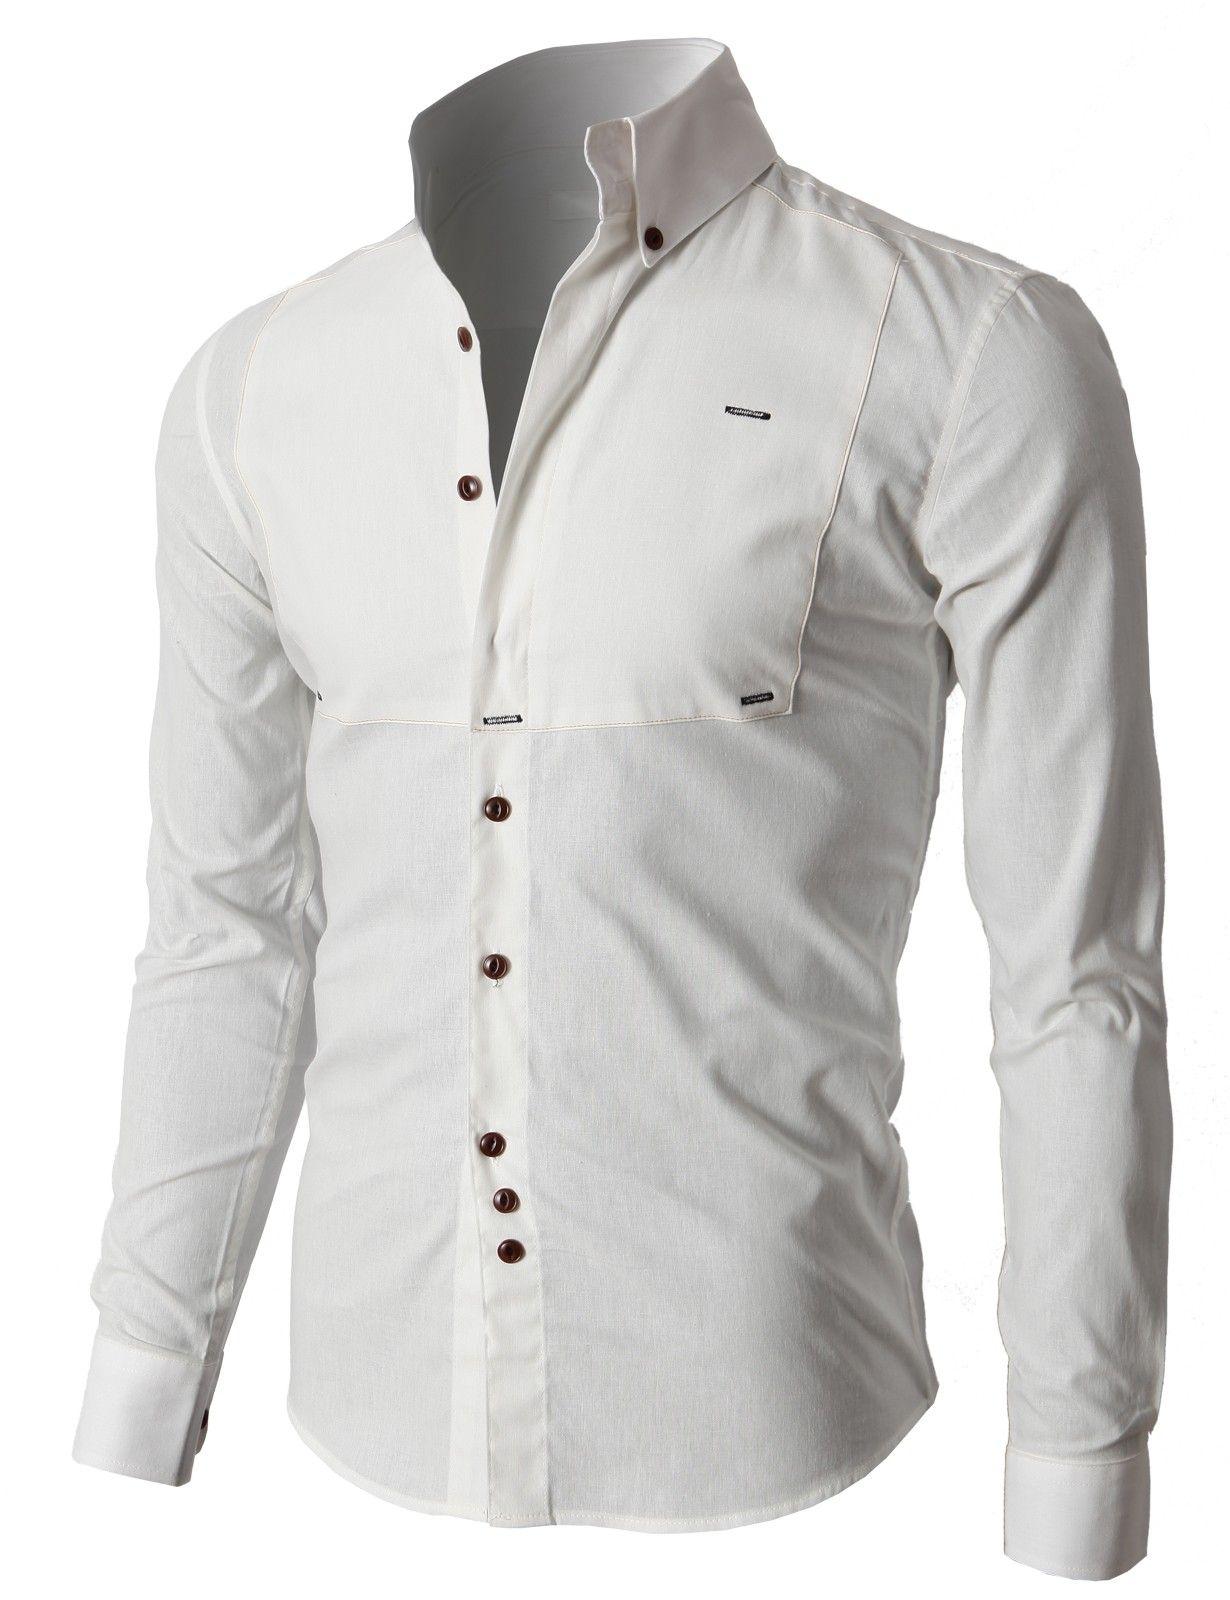 461e01c99b Doublju Premium Slim Fit Designed Button-down Shirts (KMTSTL0218)  doublju